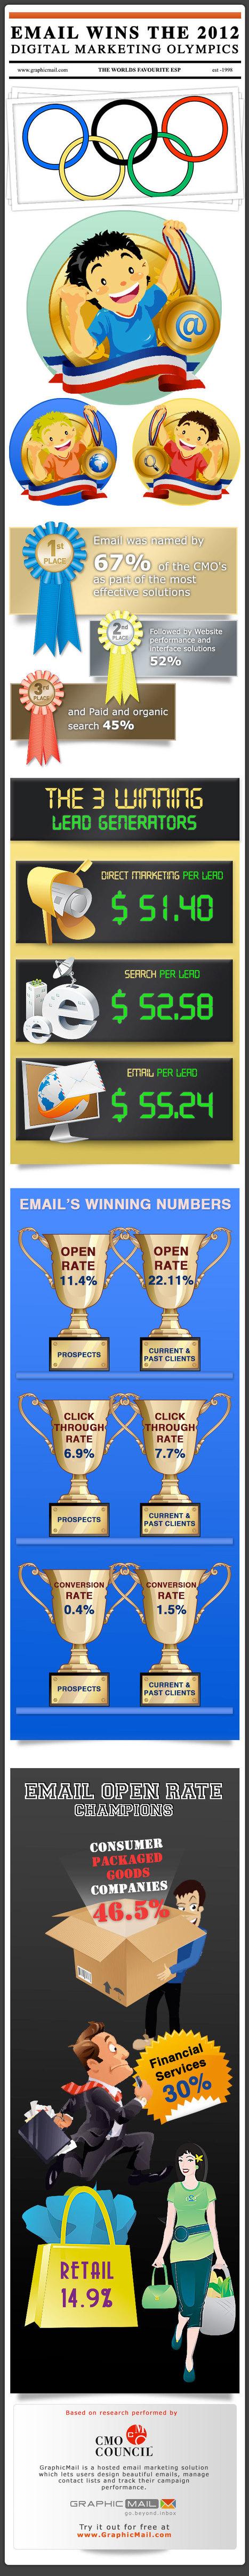 Friday Corner: Email is still the front runner in digital marketing | Marketing & Webmarketing | Scoop.it